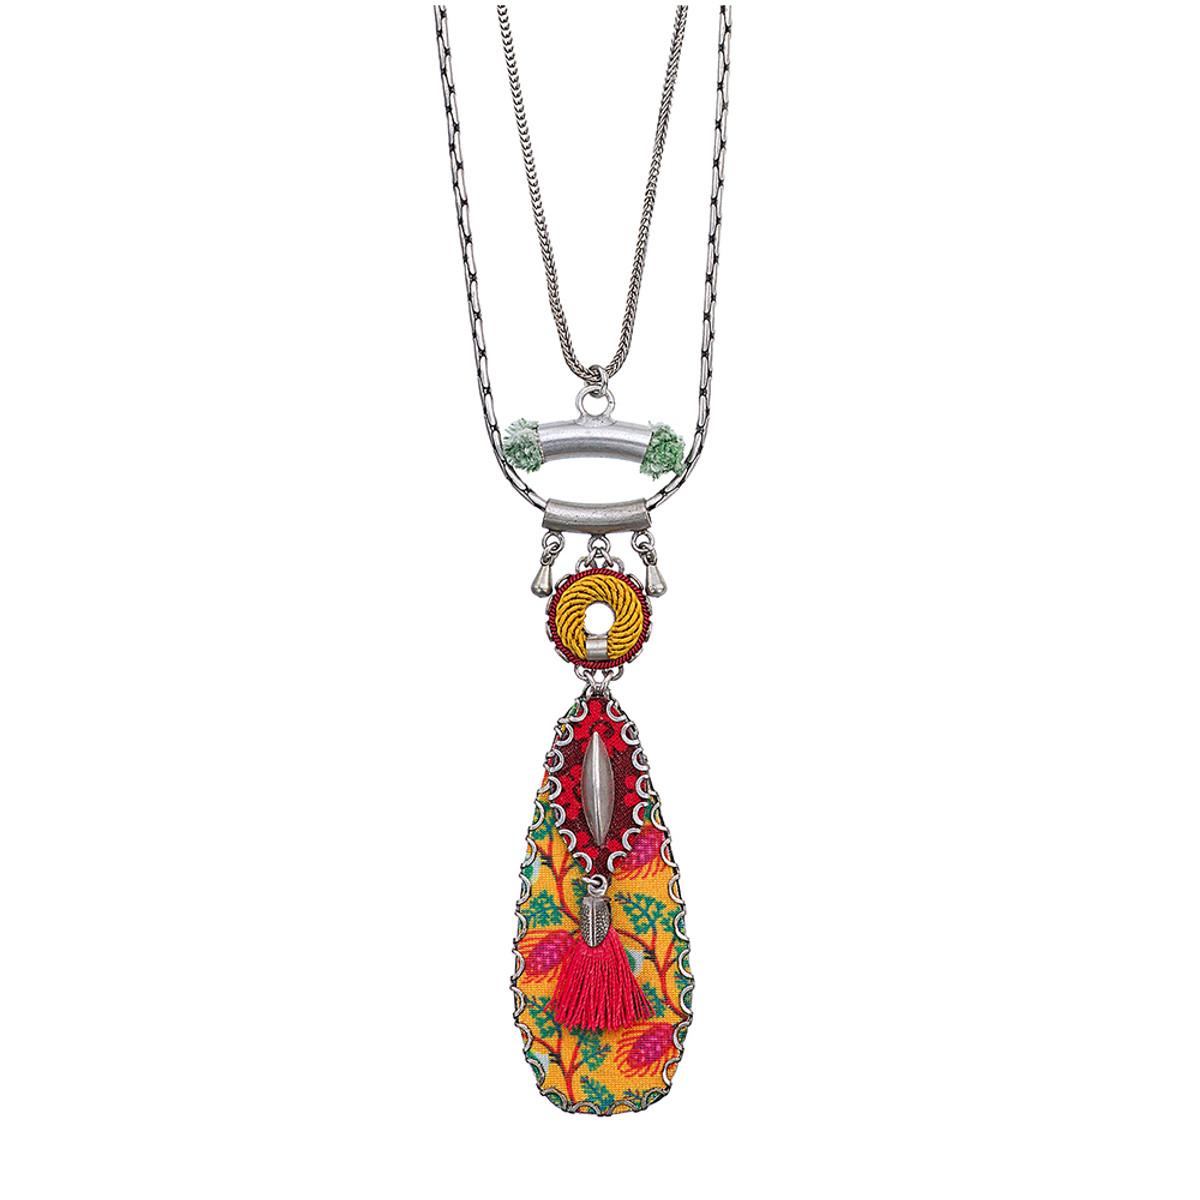 Ayala Bar Marakesh Long and Layered Necklace